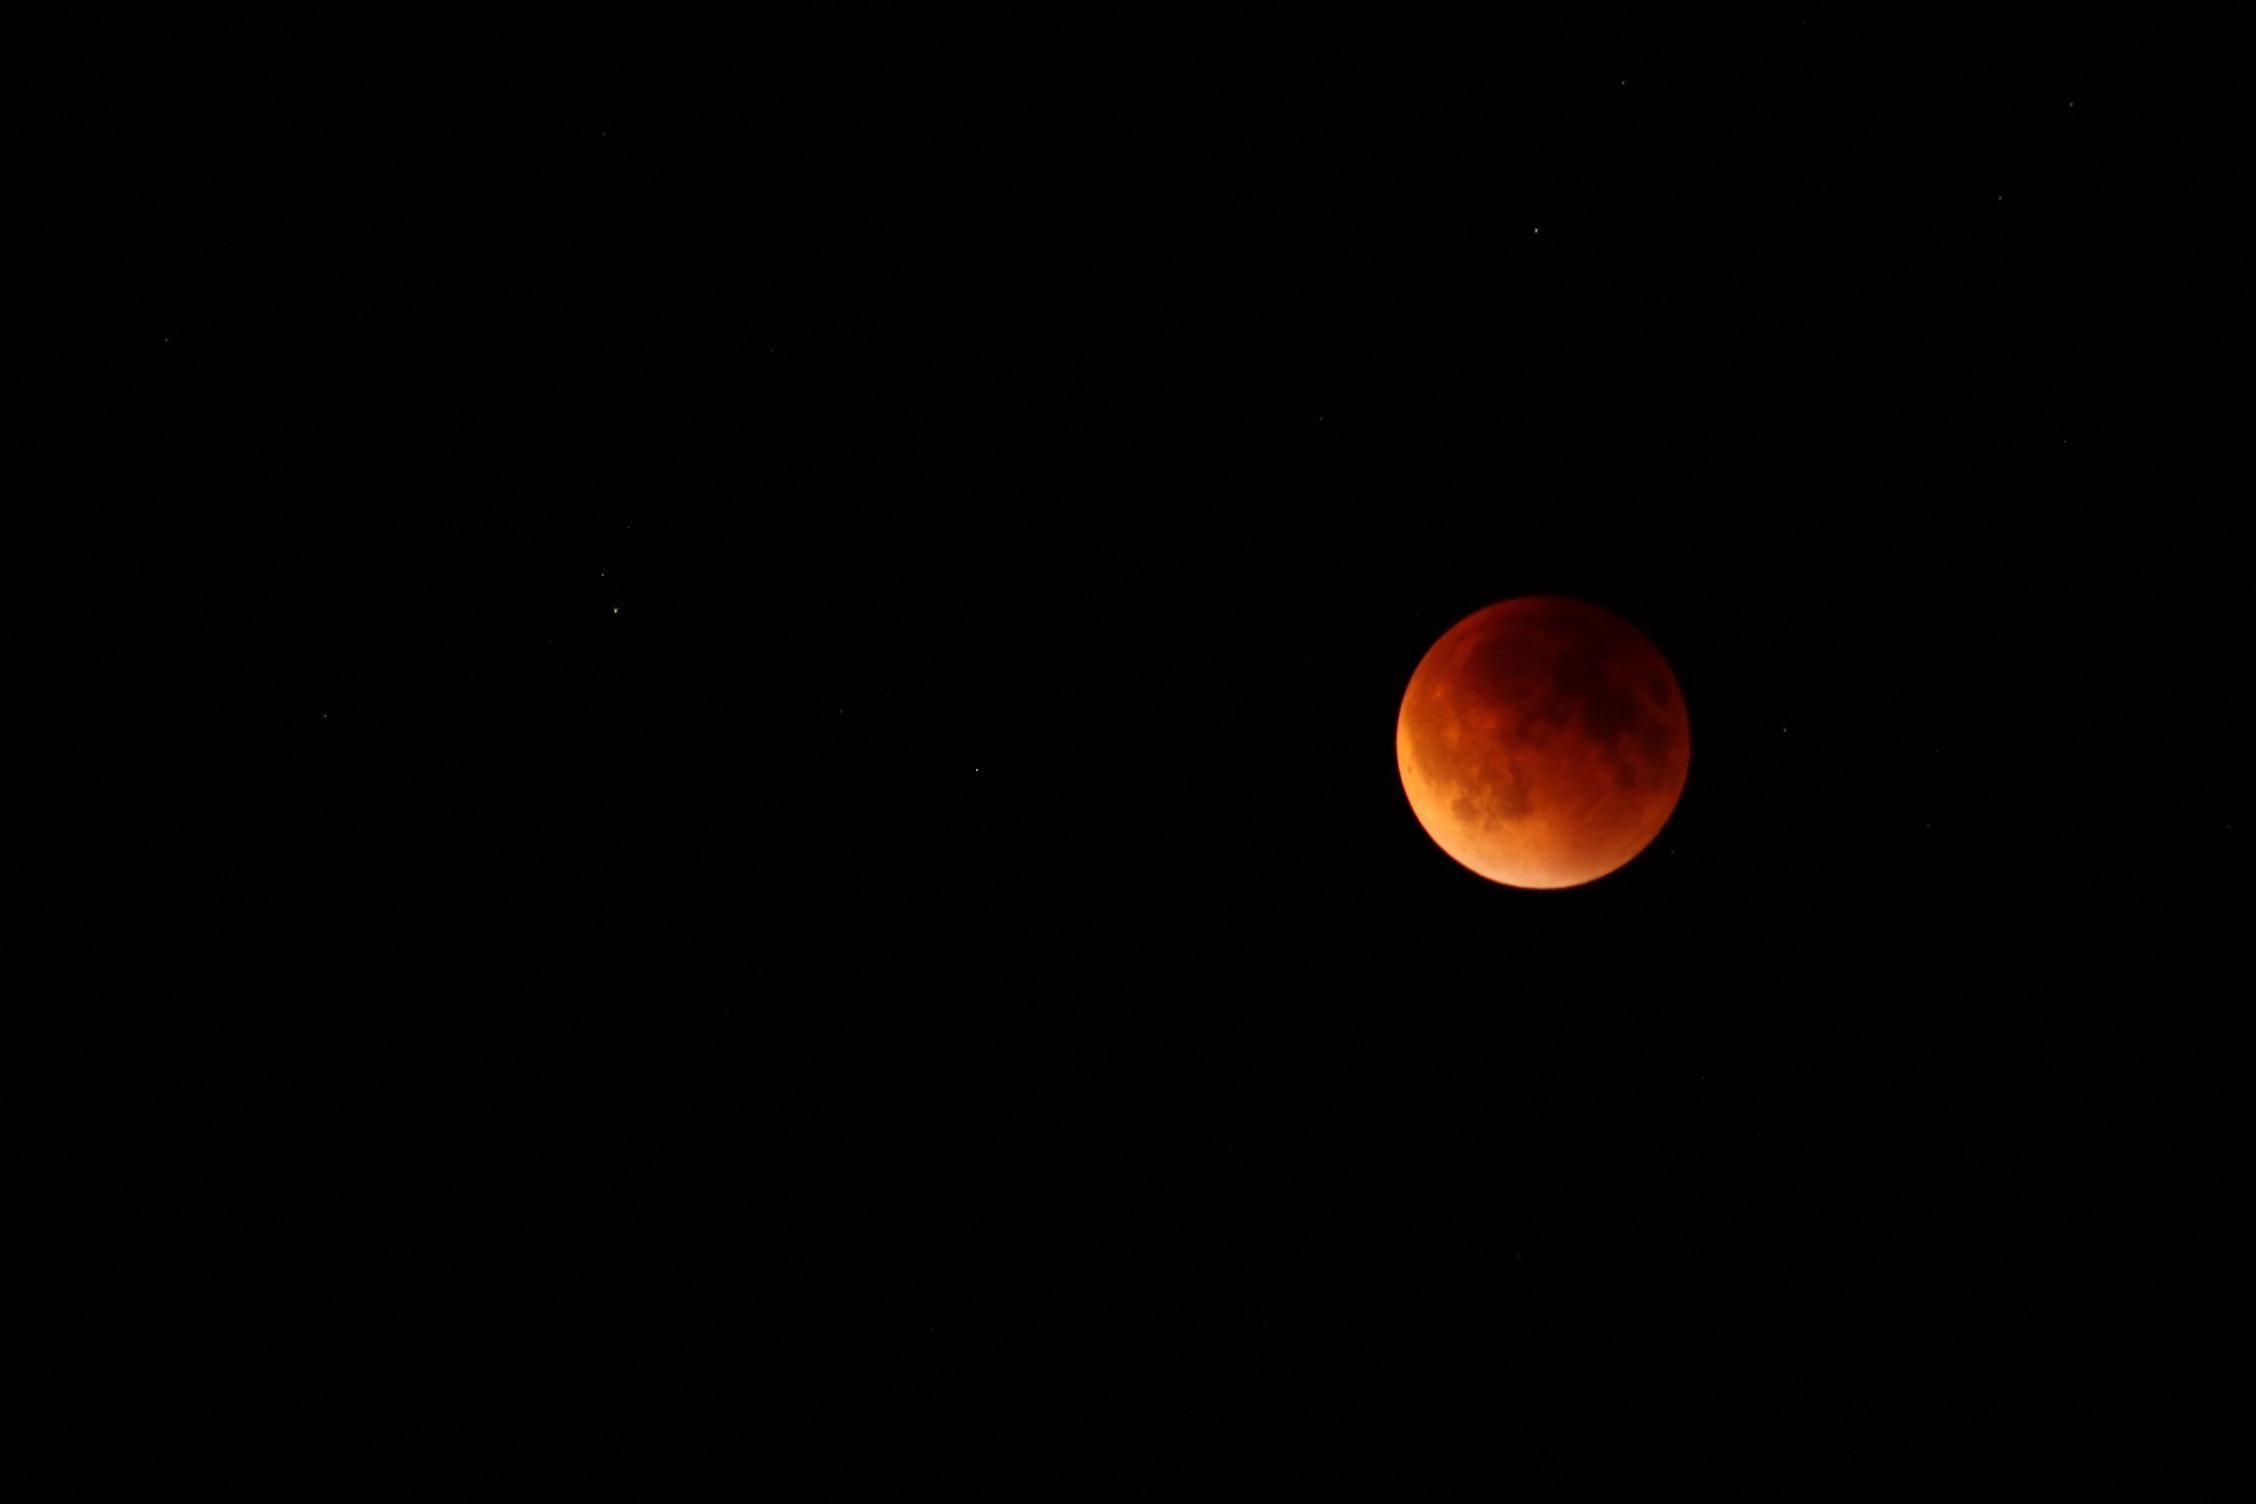 red moon february 2019 - photo #20